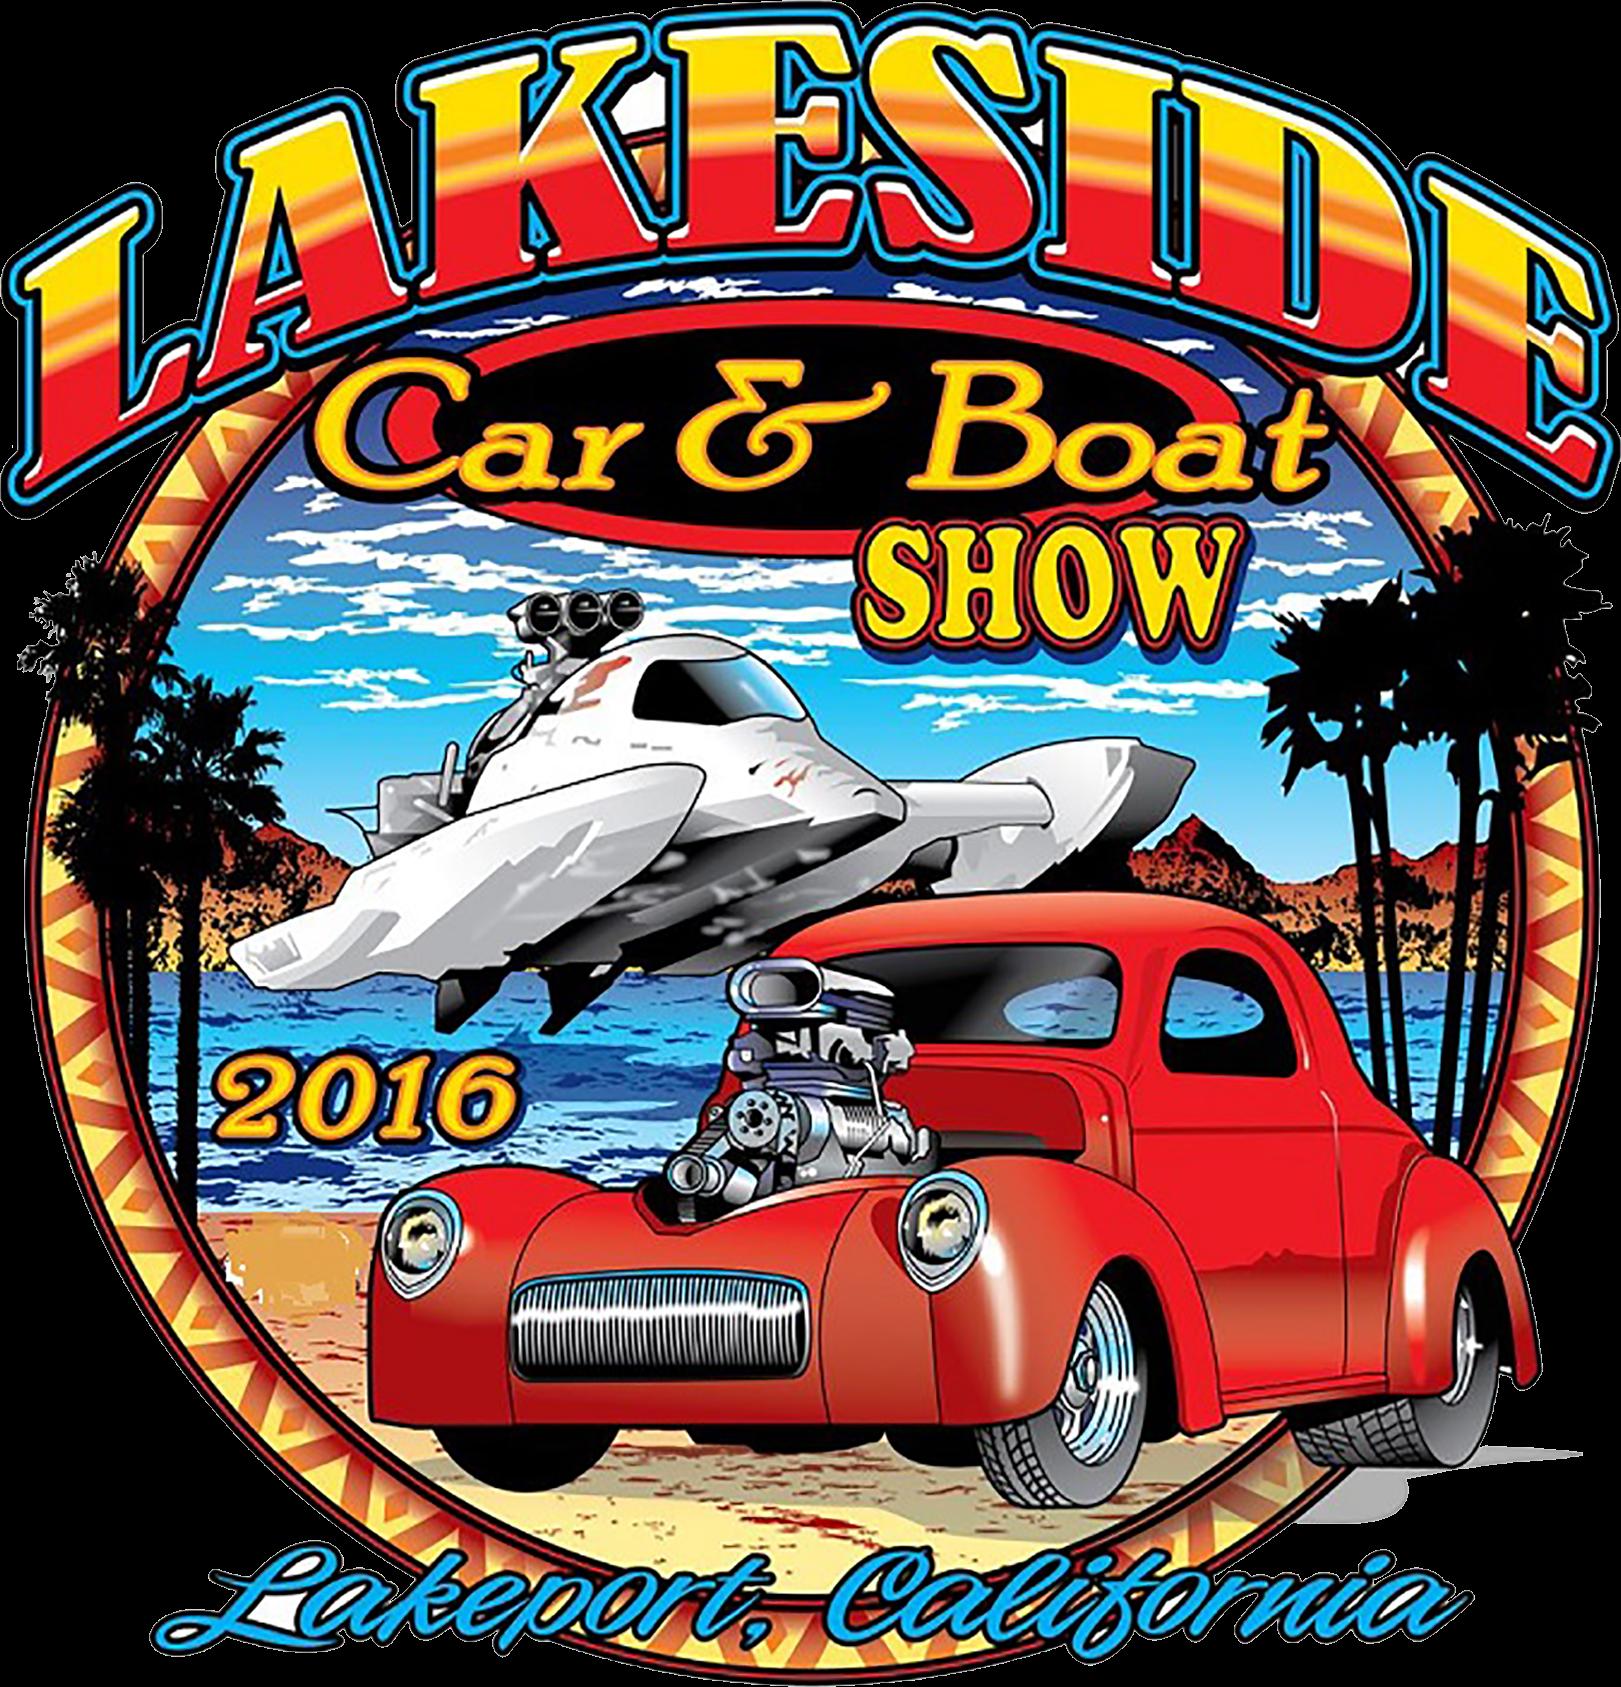 Lakeside Car & Boat Show Logo.png